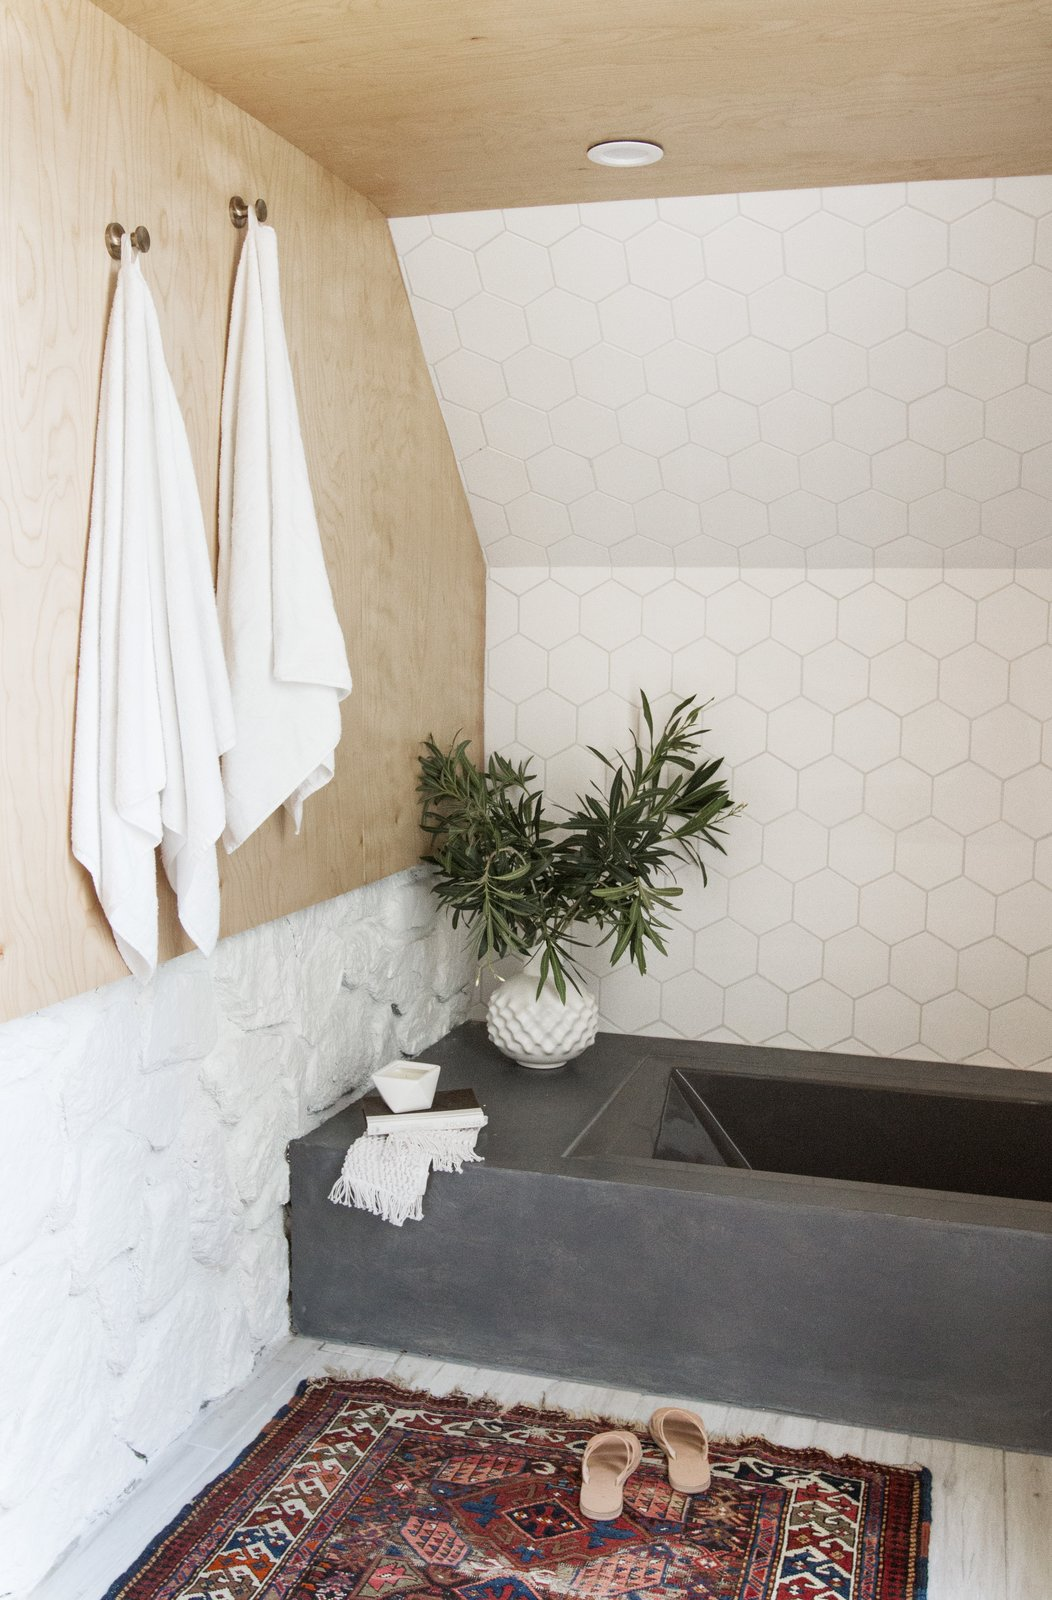 Kohler Underscore Rectangle Drop-In VibrAcoustic Bath by Kohler - Dwell